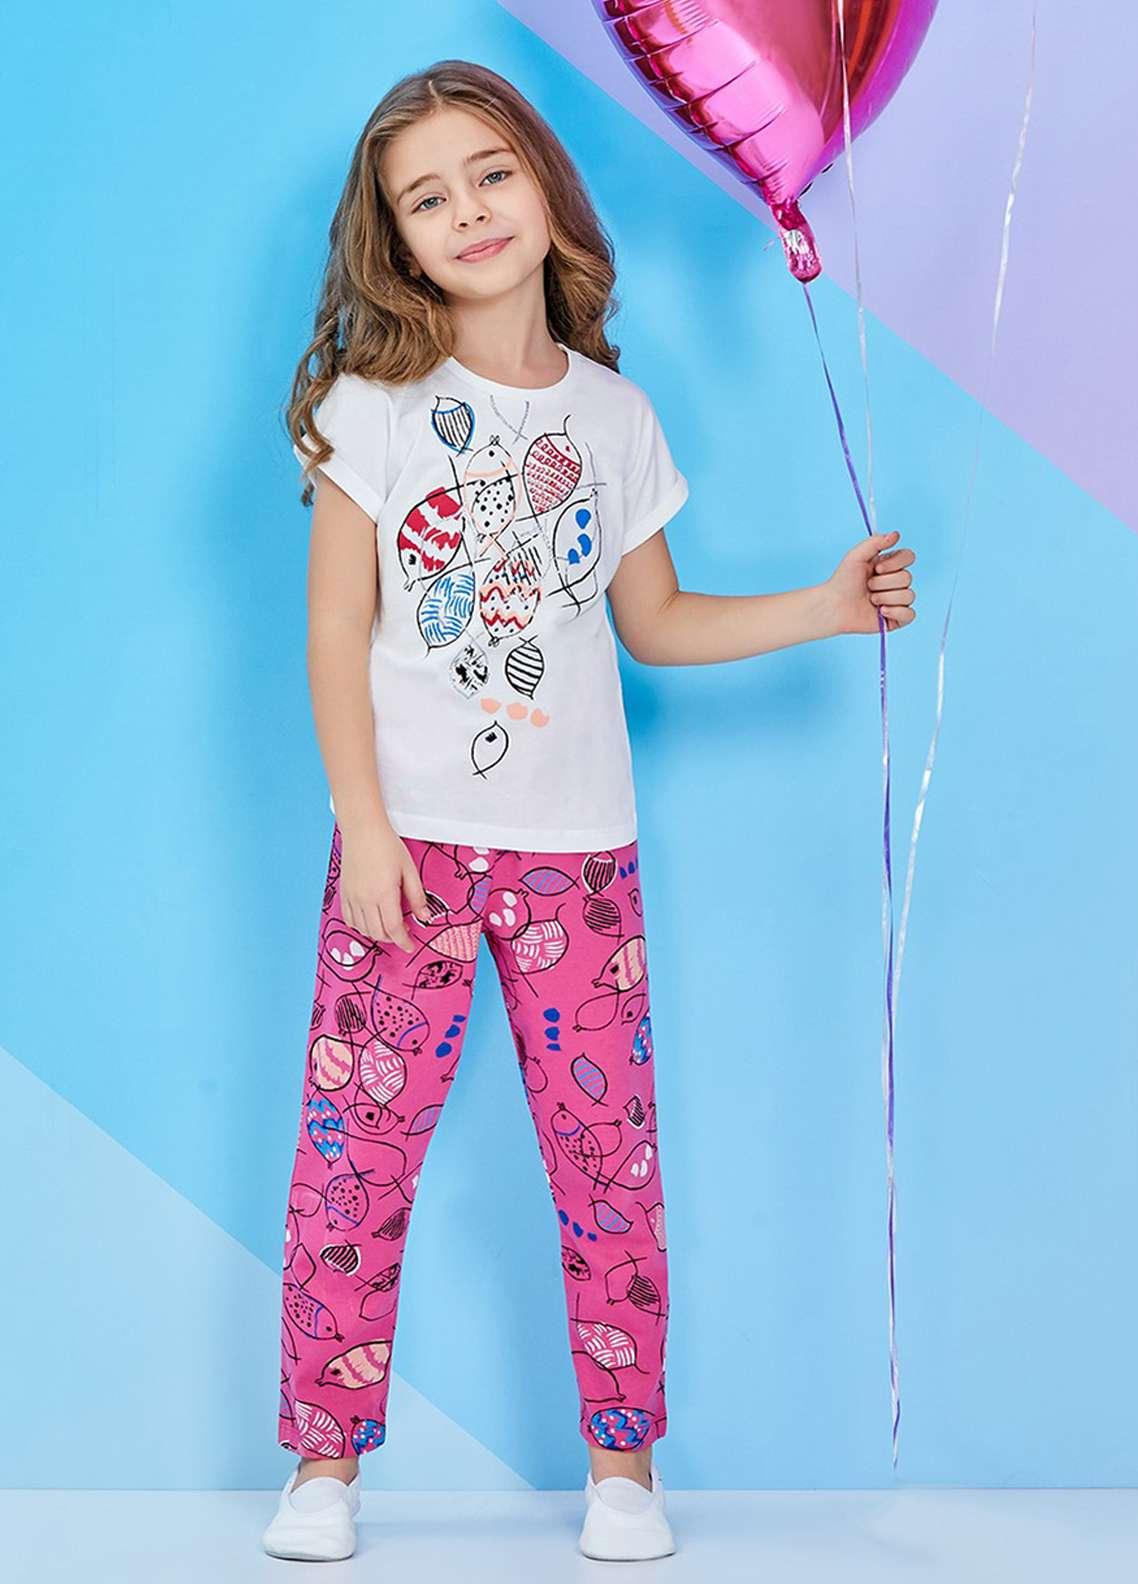 Cotton Net Kids Nightwear 2 Piece NS18K 2255 WHITE